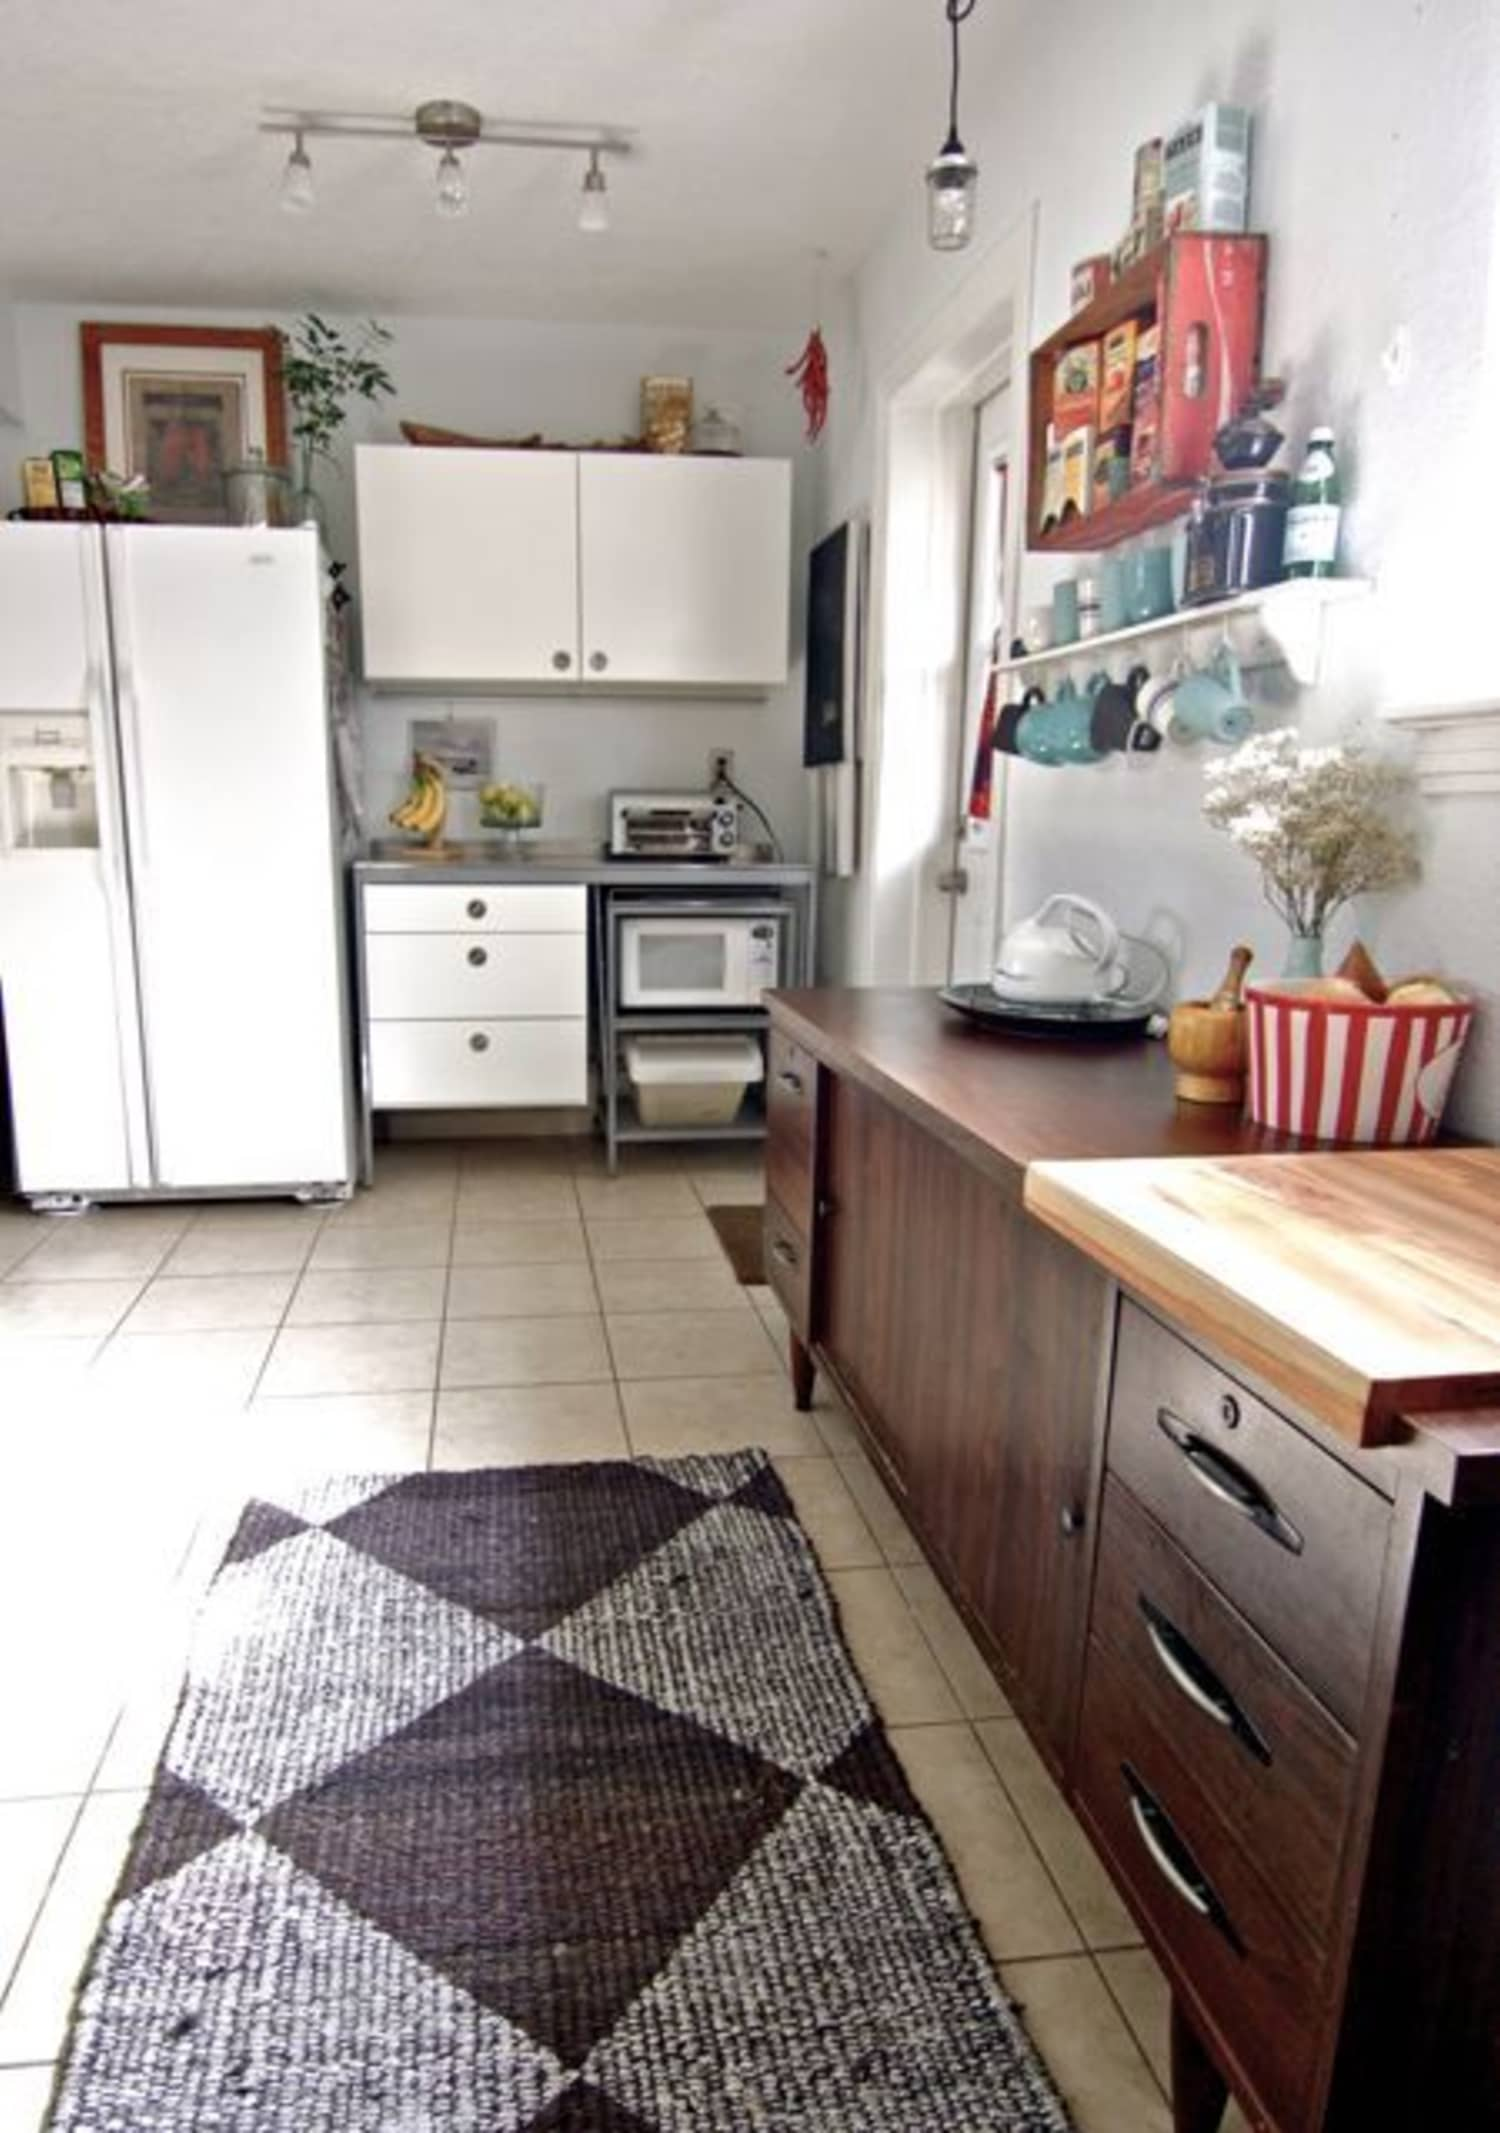 Loi's Budget-Friendly Kitchen Facelift